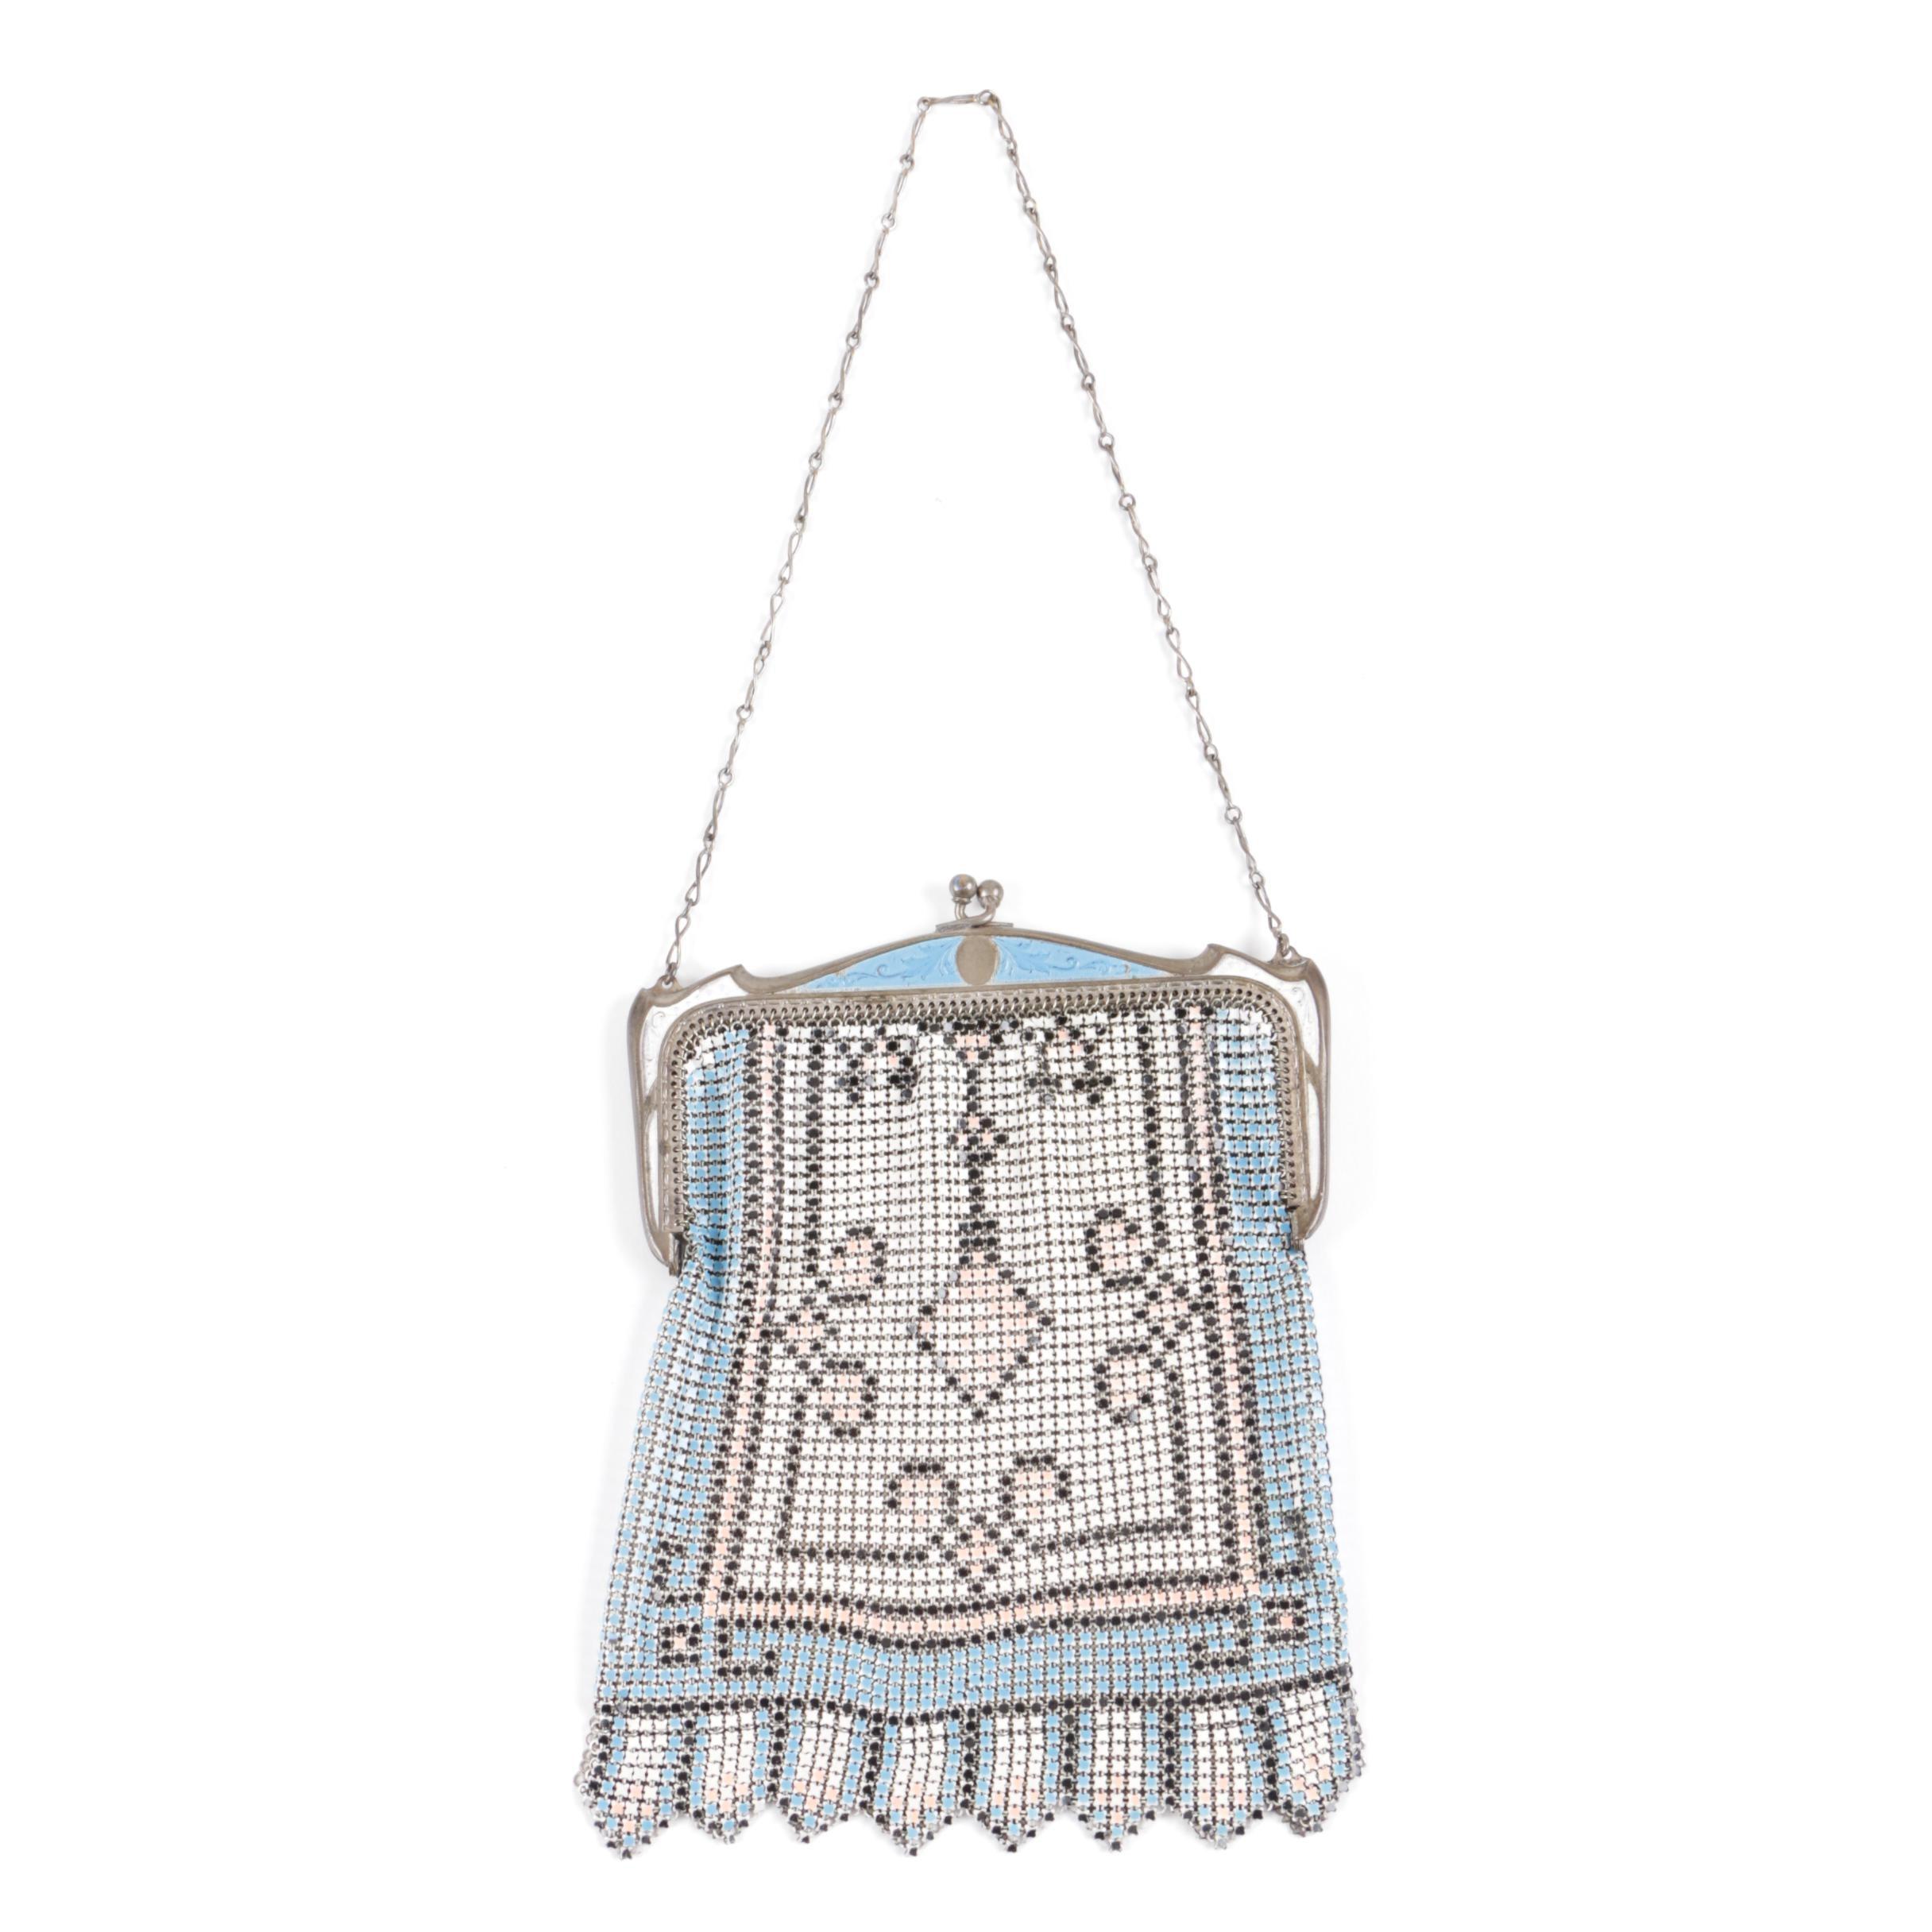 Circa 1920s Enamel Mesh Handbag